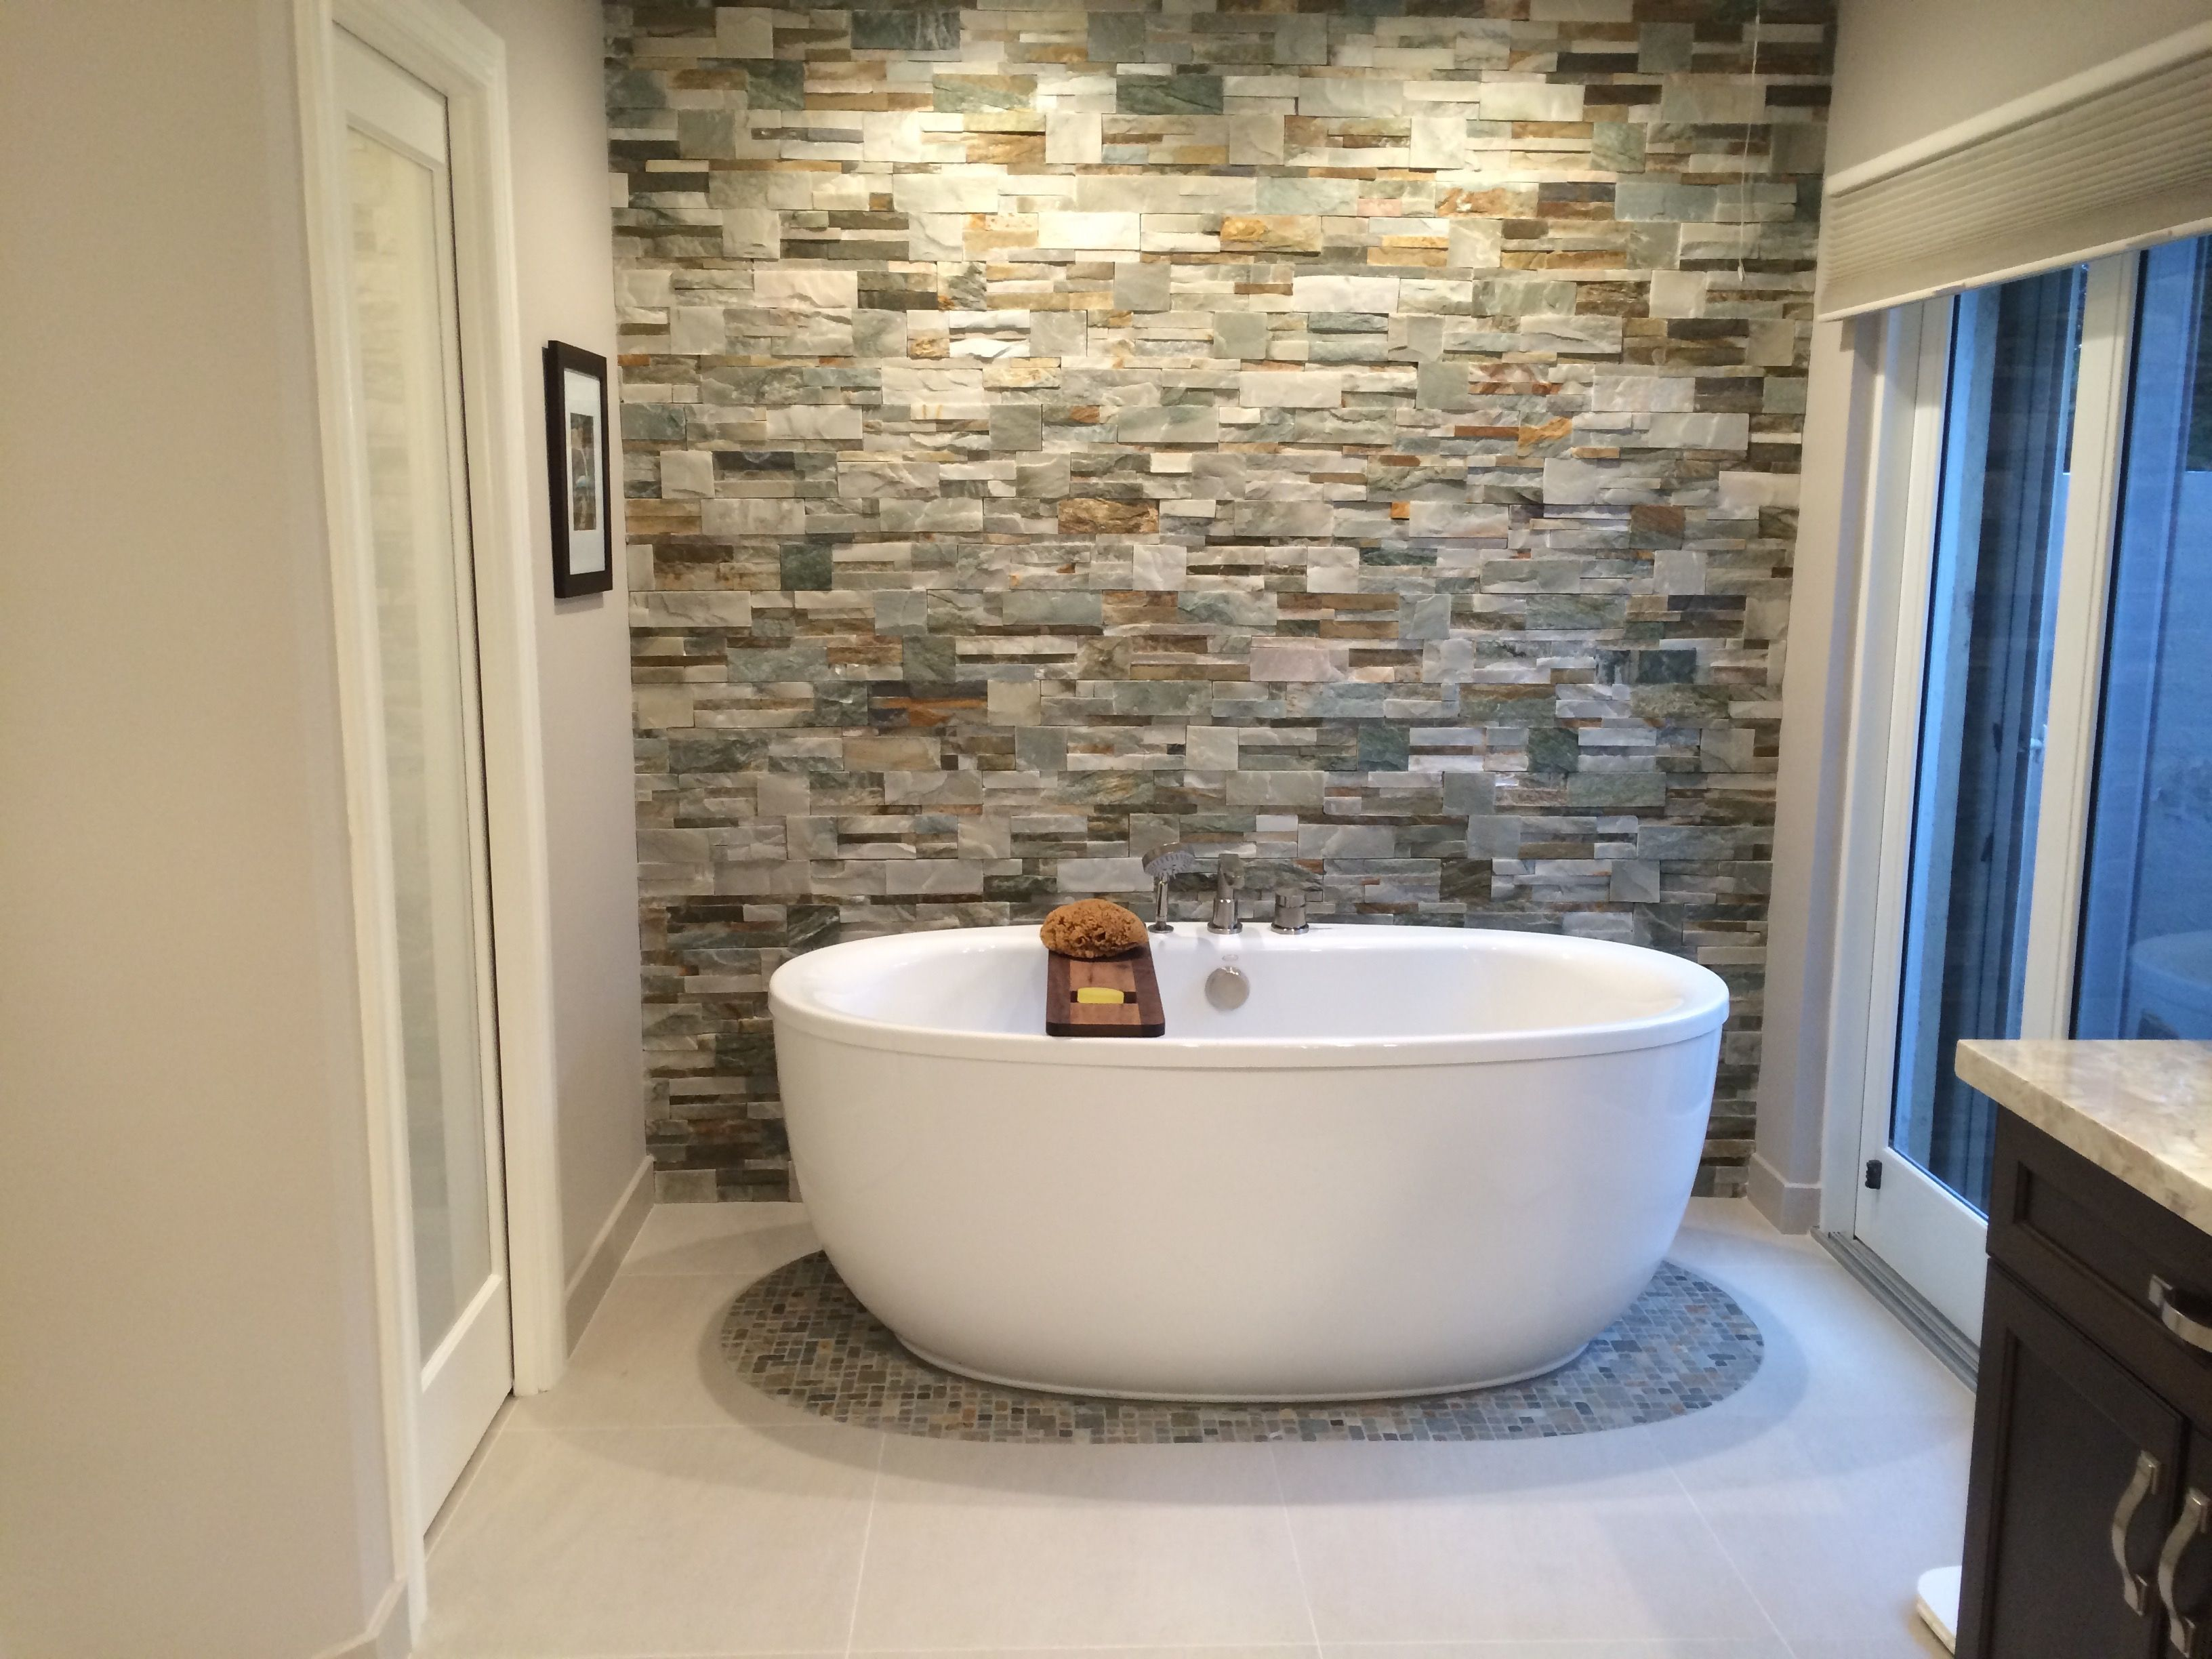 Natural Stone In Master Bath Natural Stone Tile Rug Under Tub Bathtub Remodel Tub Remodel Natural Stone Tile Bathroom